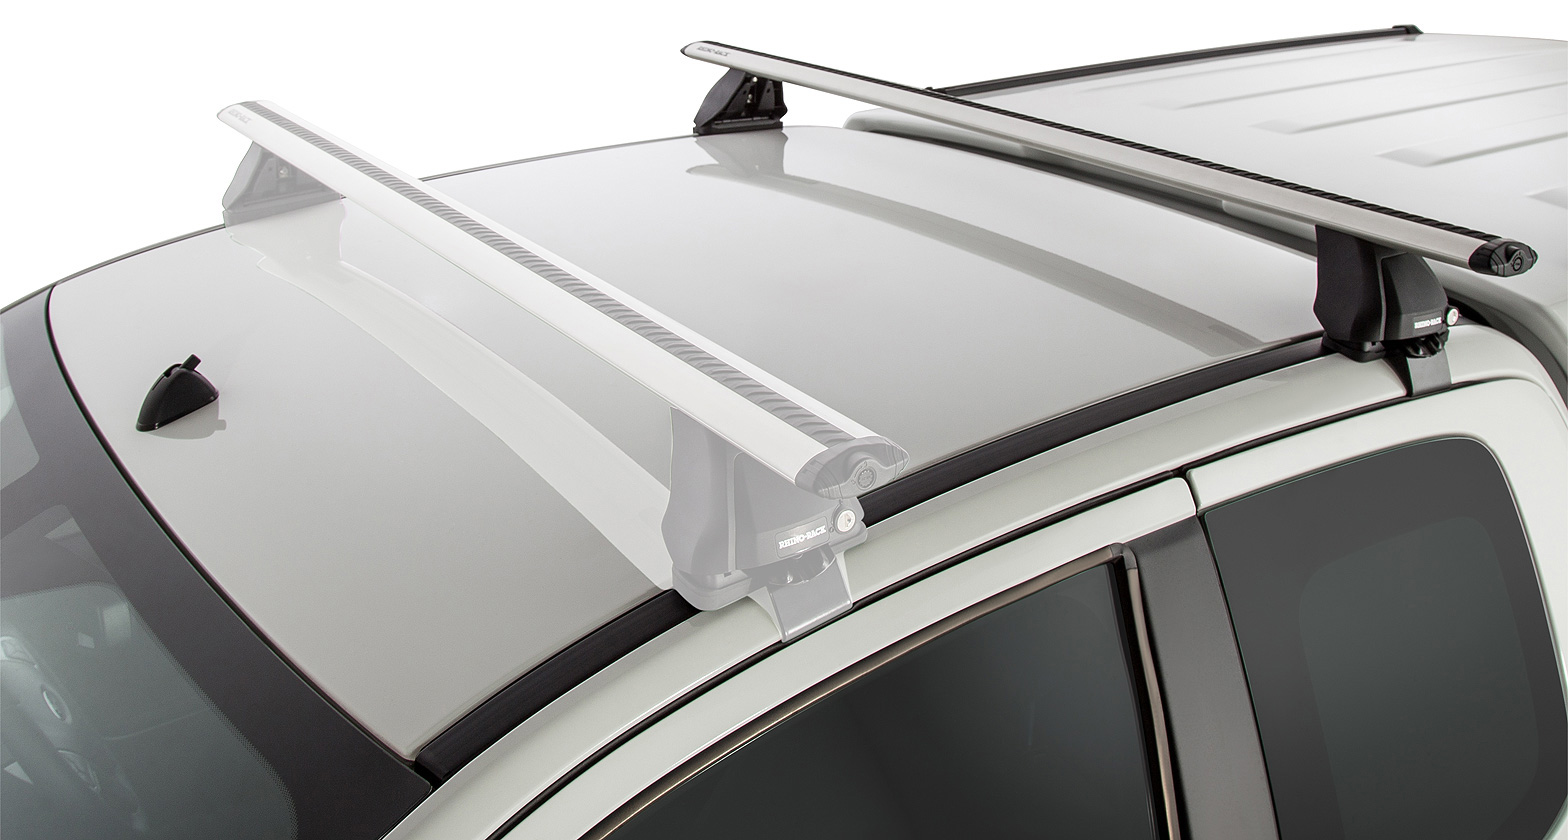 Ja2611 Vortex 2500 Silver 1 Bar Roof Rack Rear